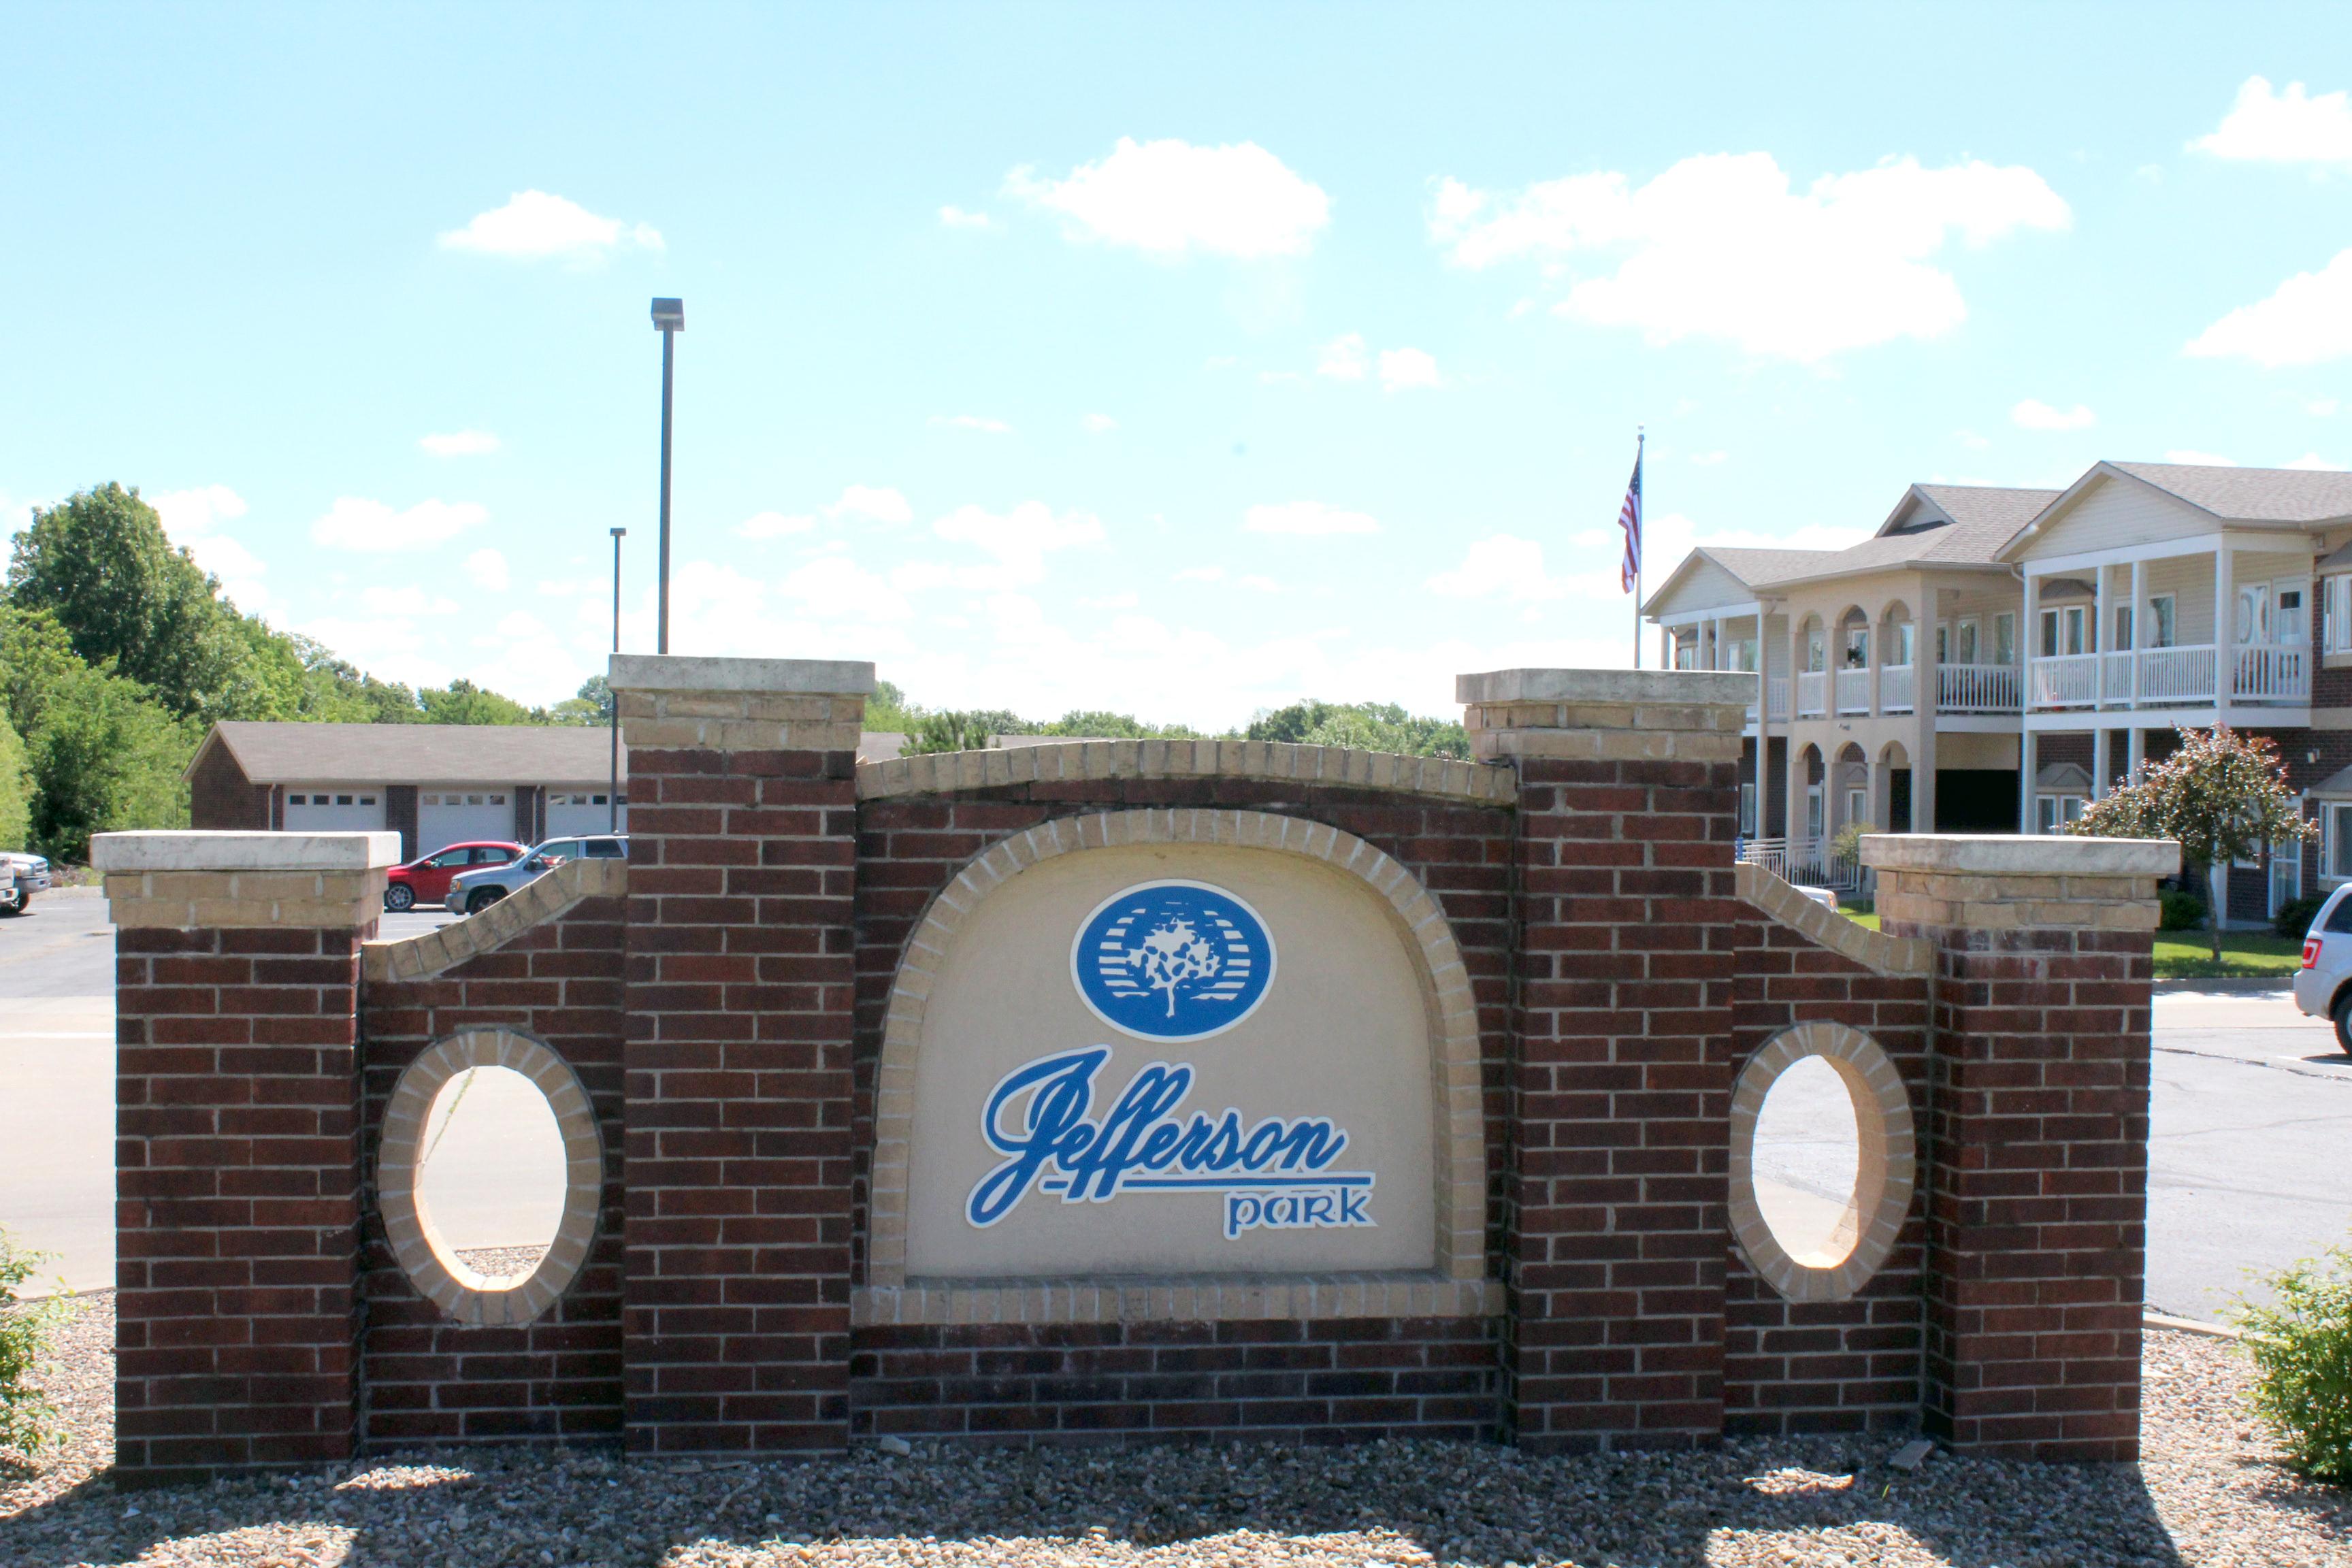 Jefferson Park | Carroll County Memorial Hospital